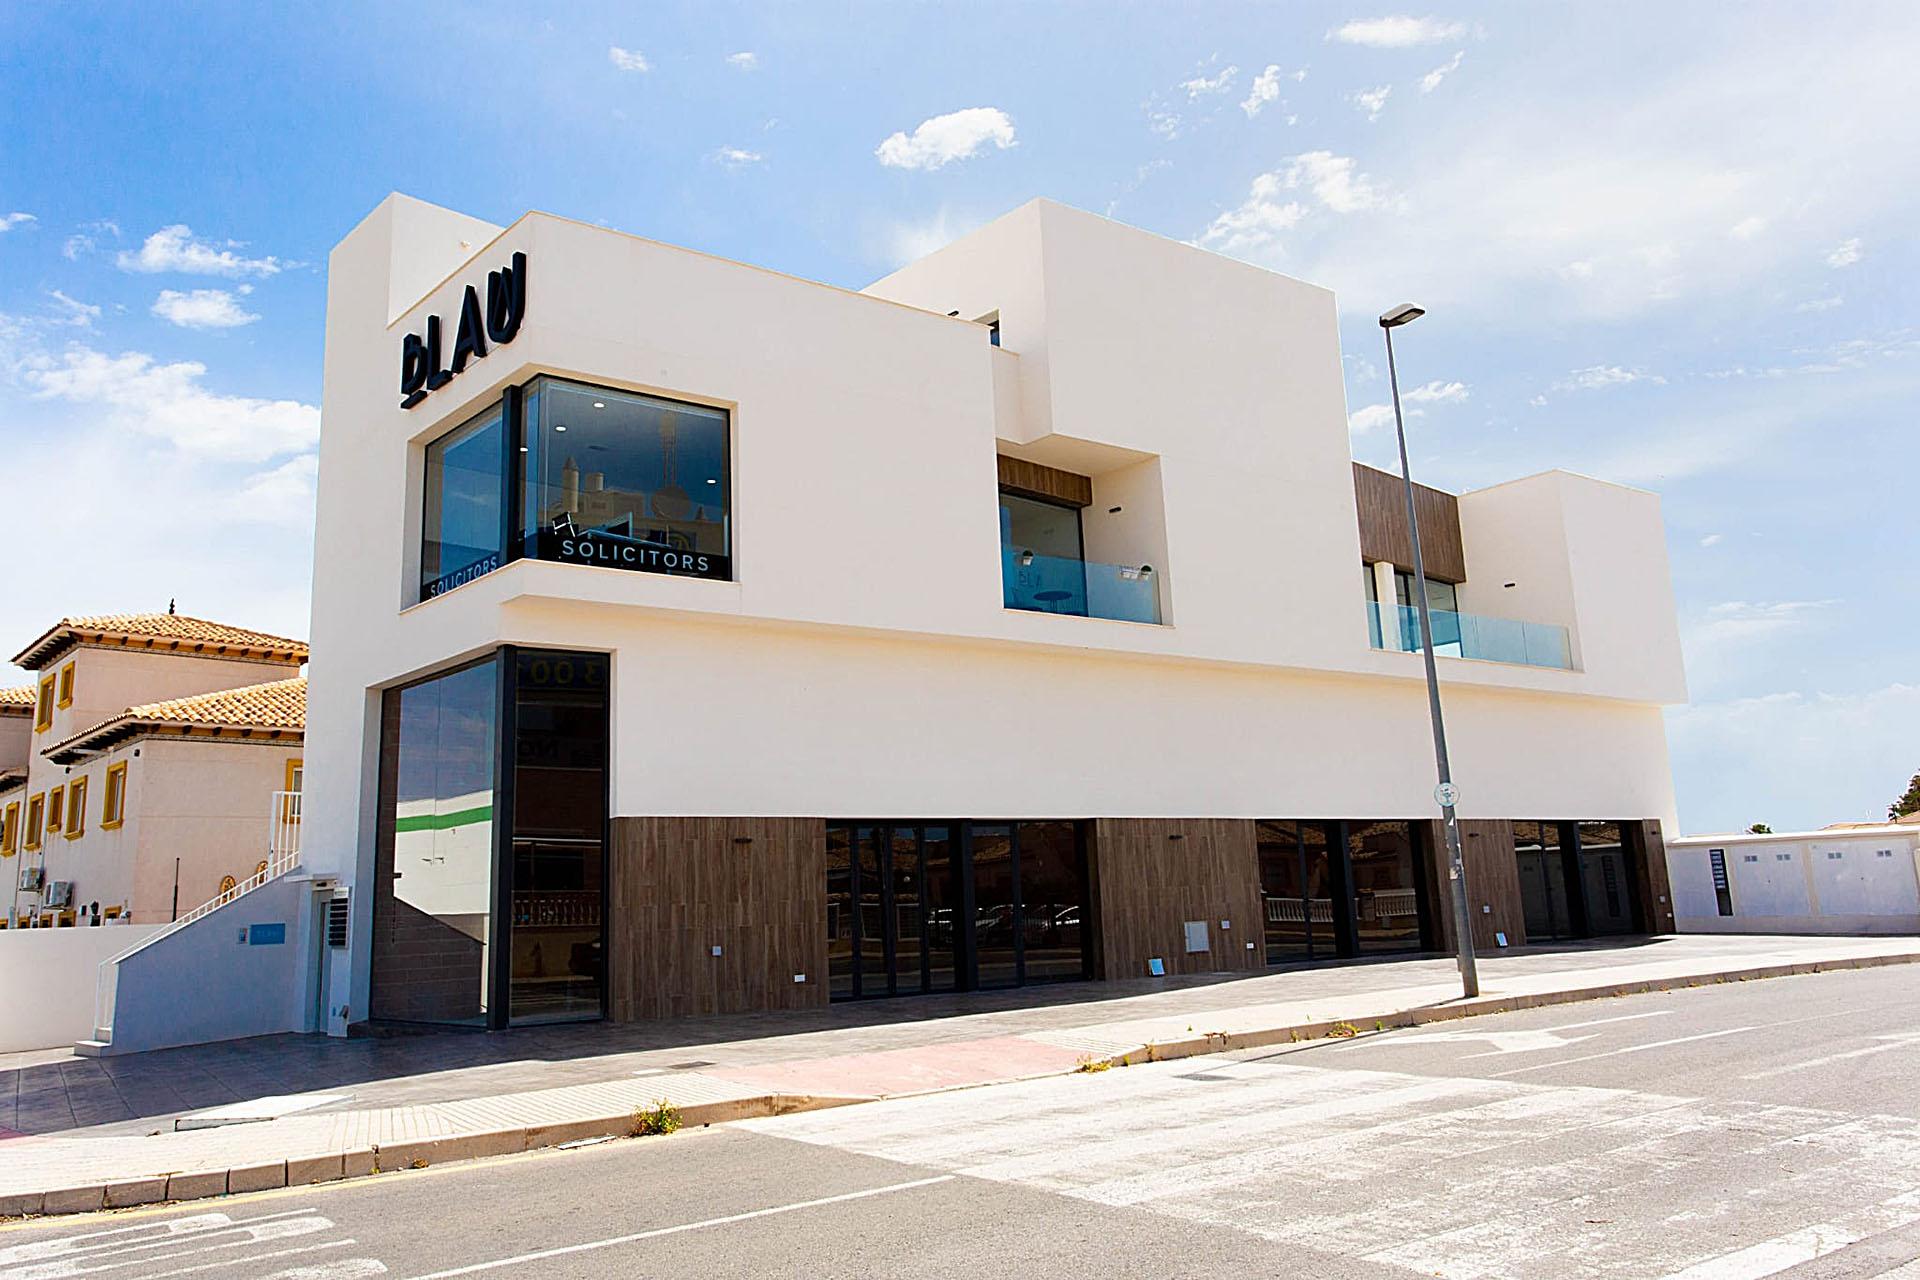 Wynajem, Lokale, Biura, Torrevieja, Orihuela Costa